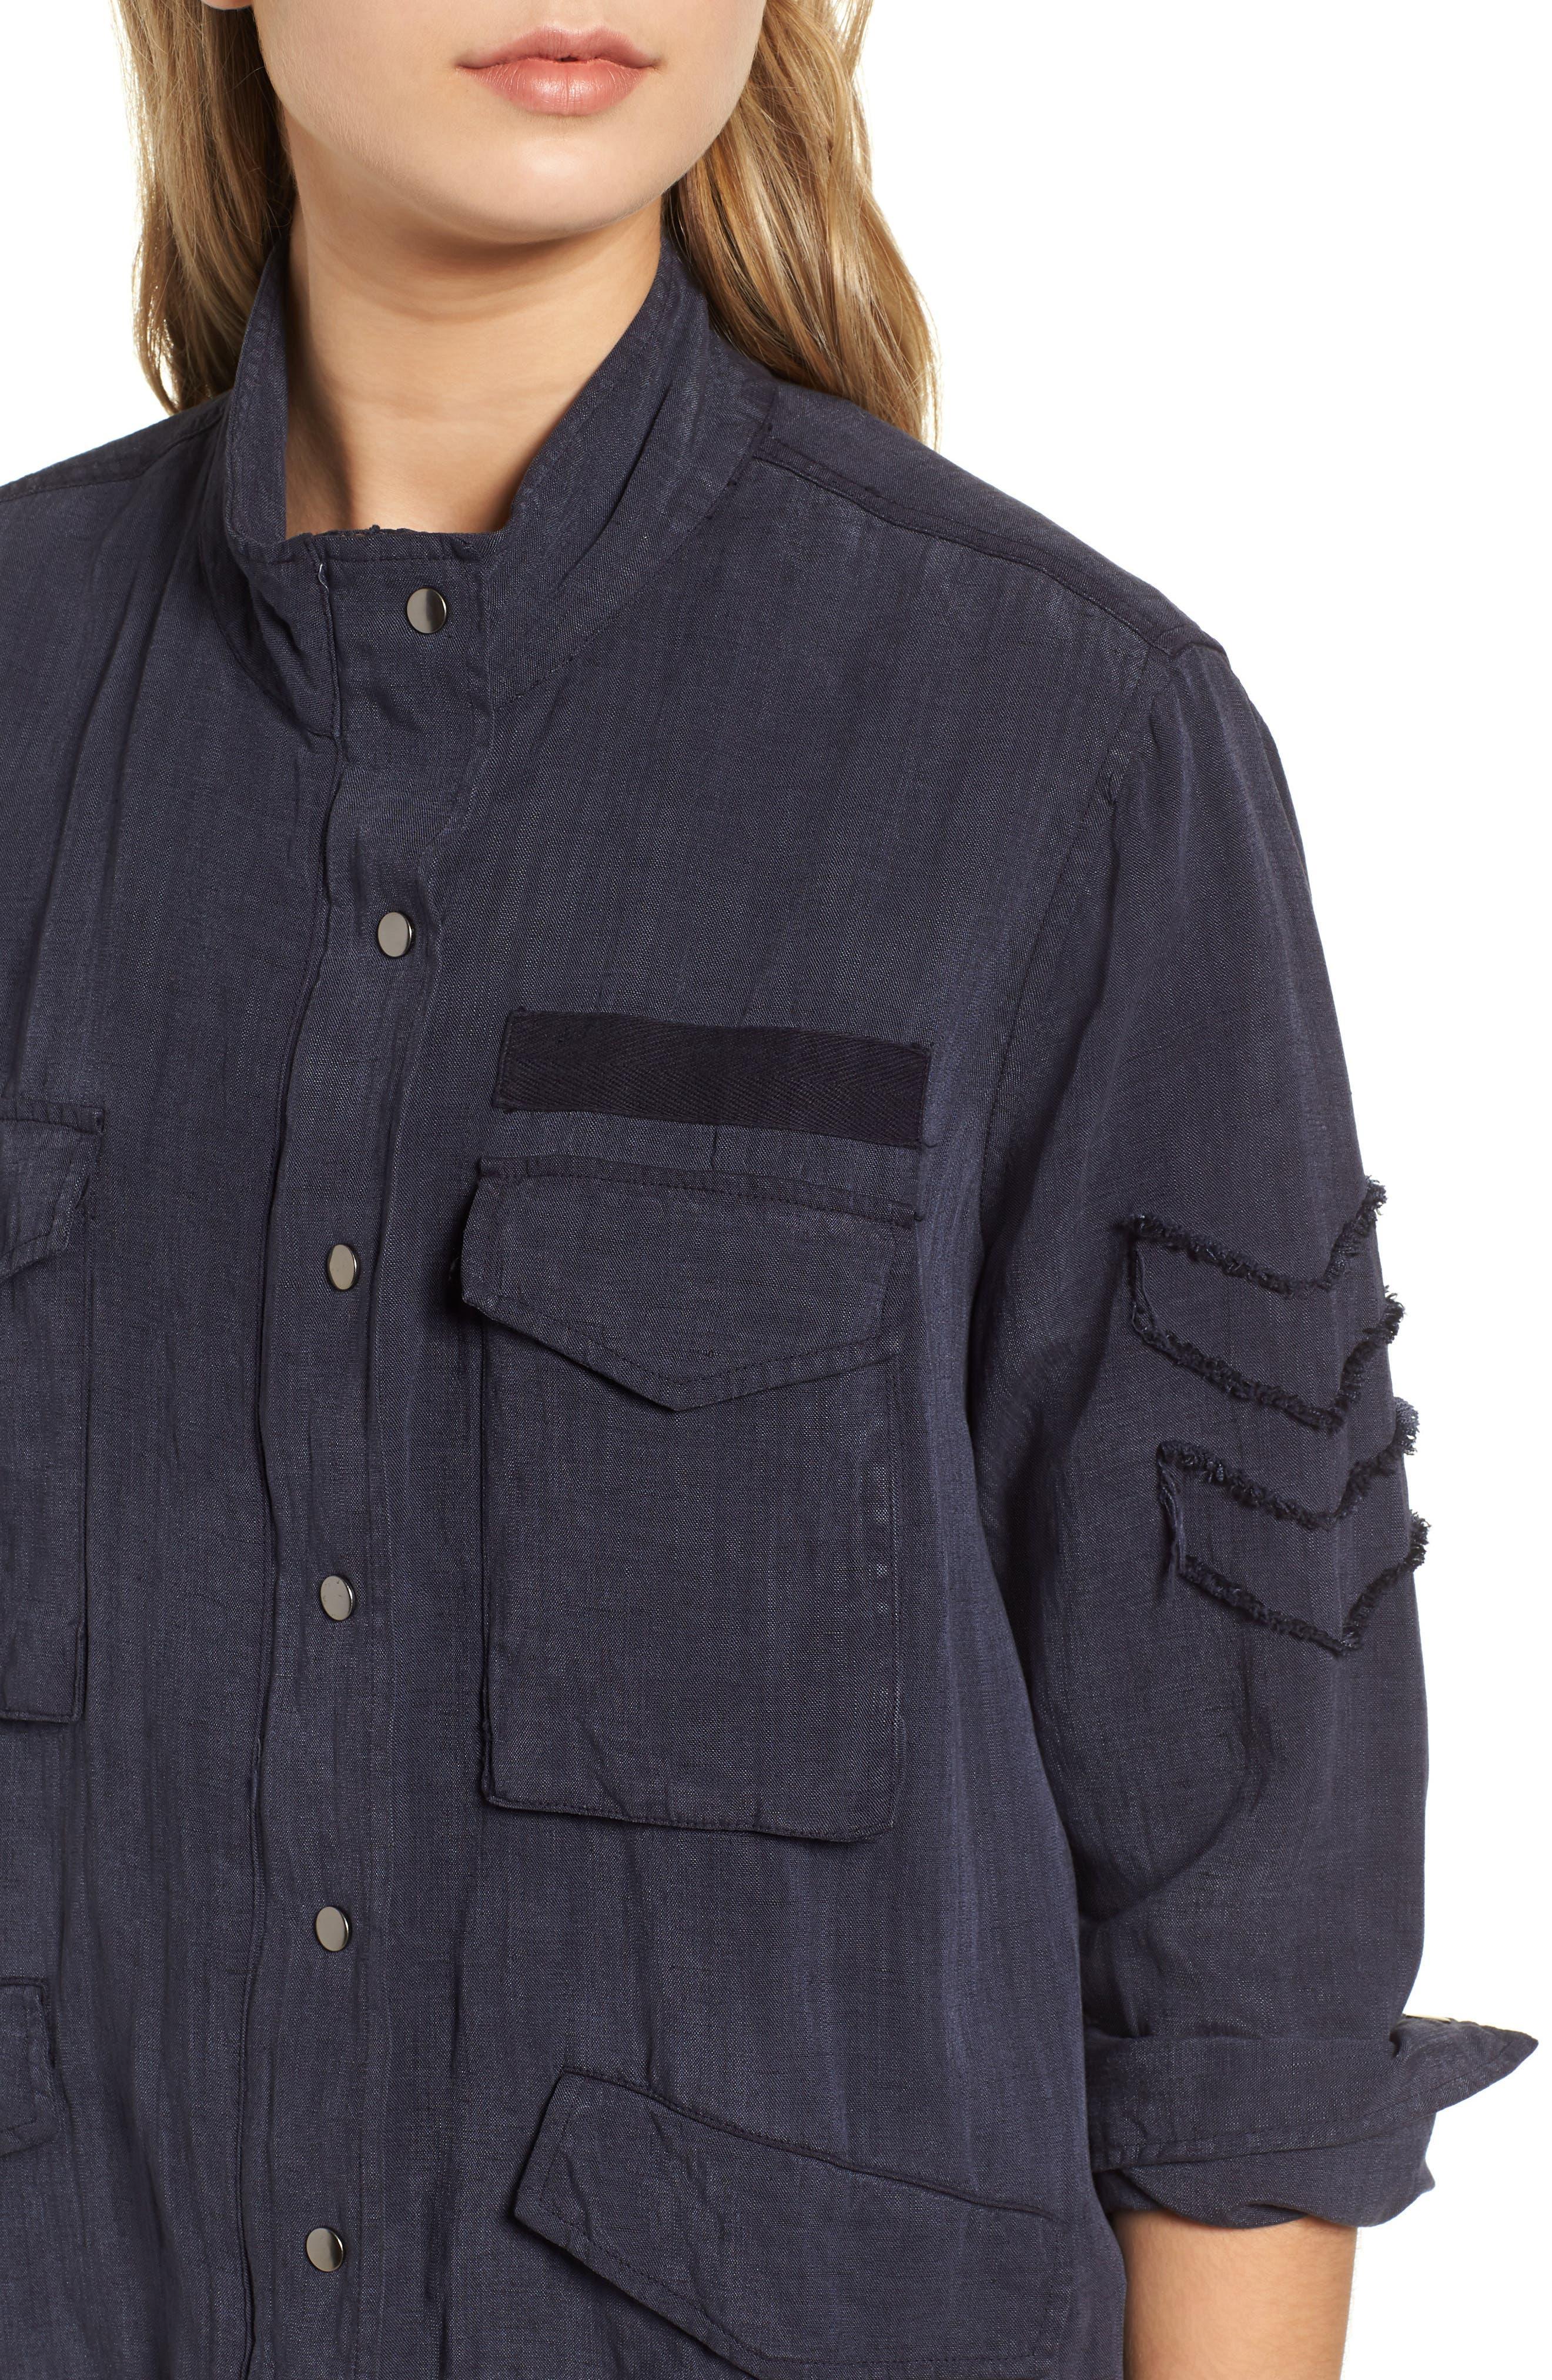 Halifax Drawstring Jacket,                             Alternate thumbnail 4, color,                             410